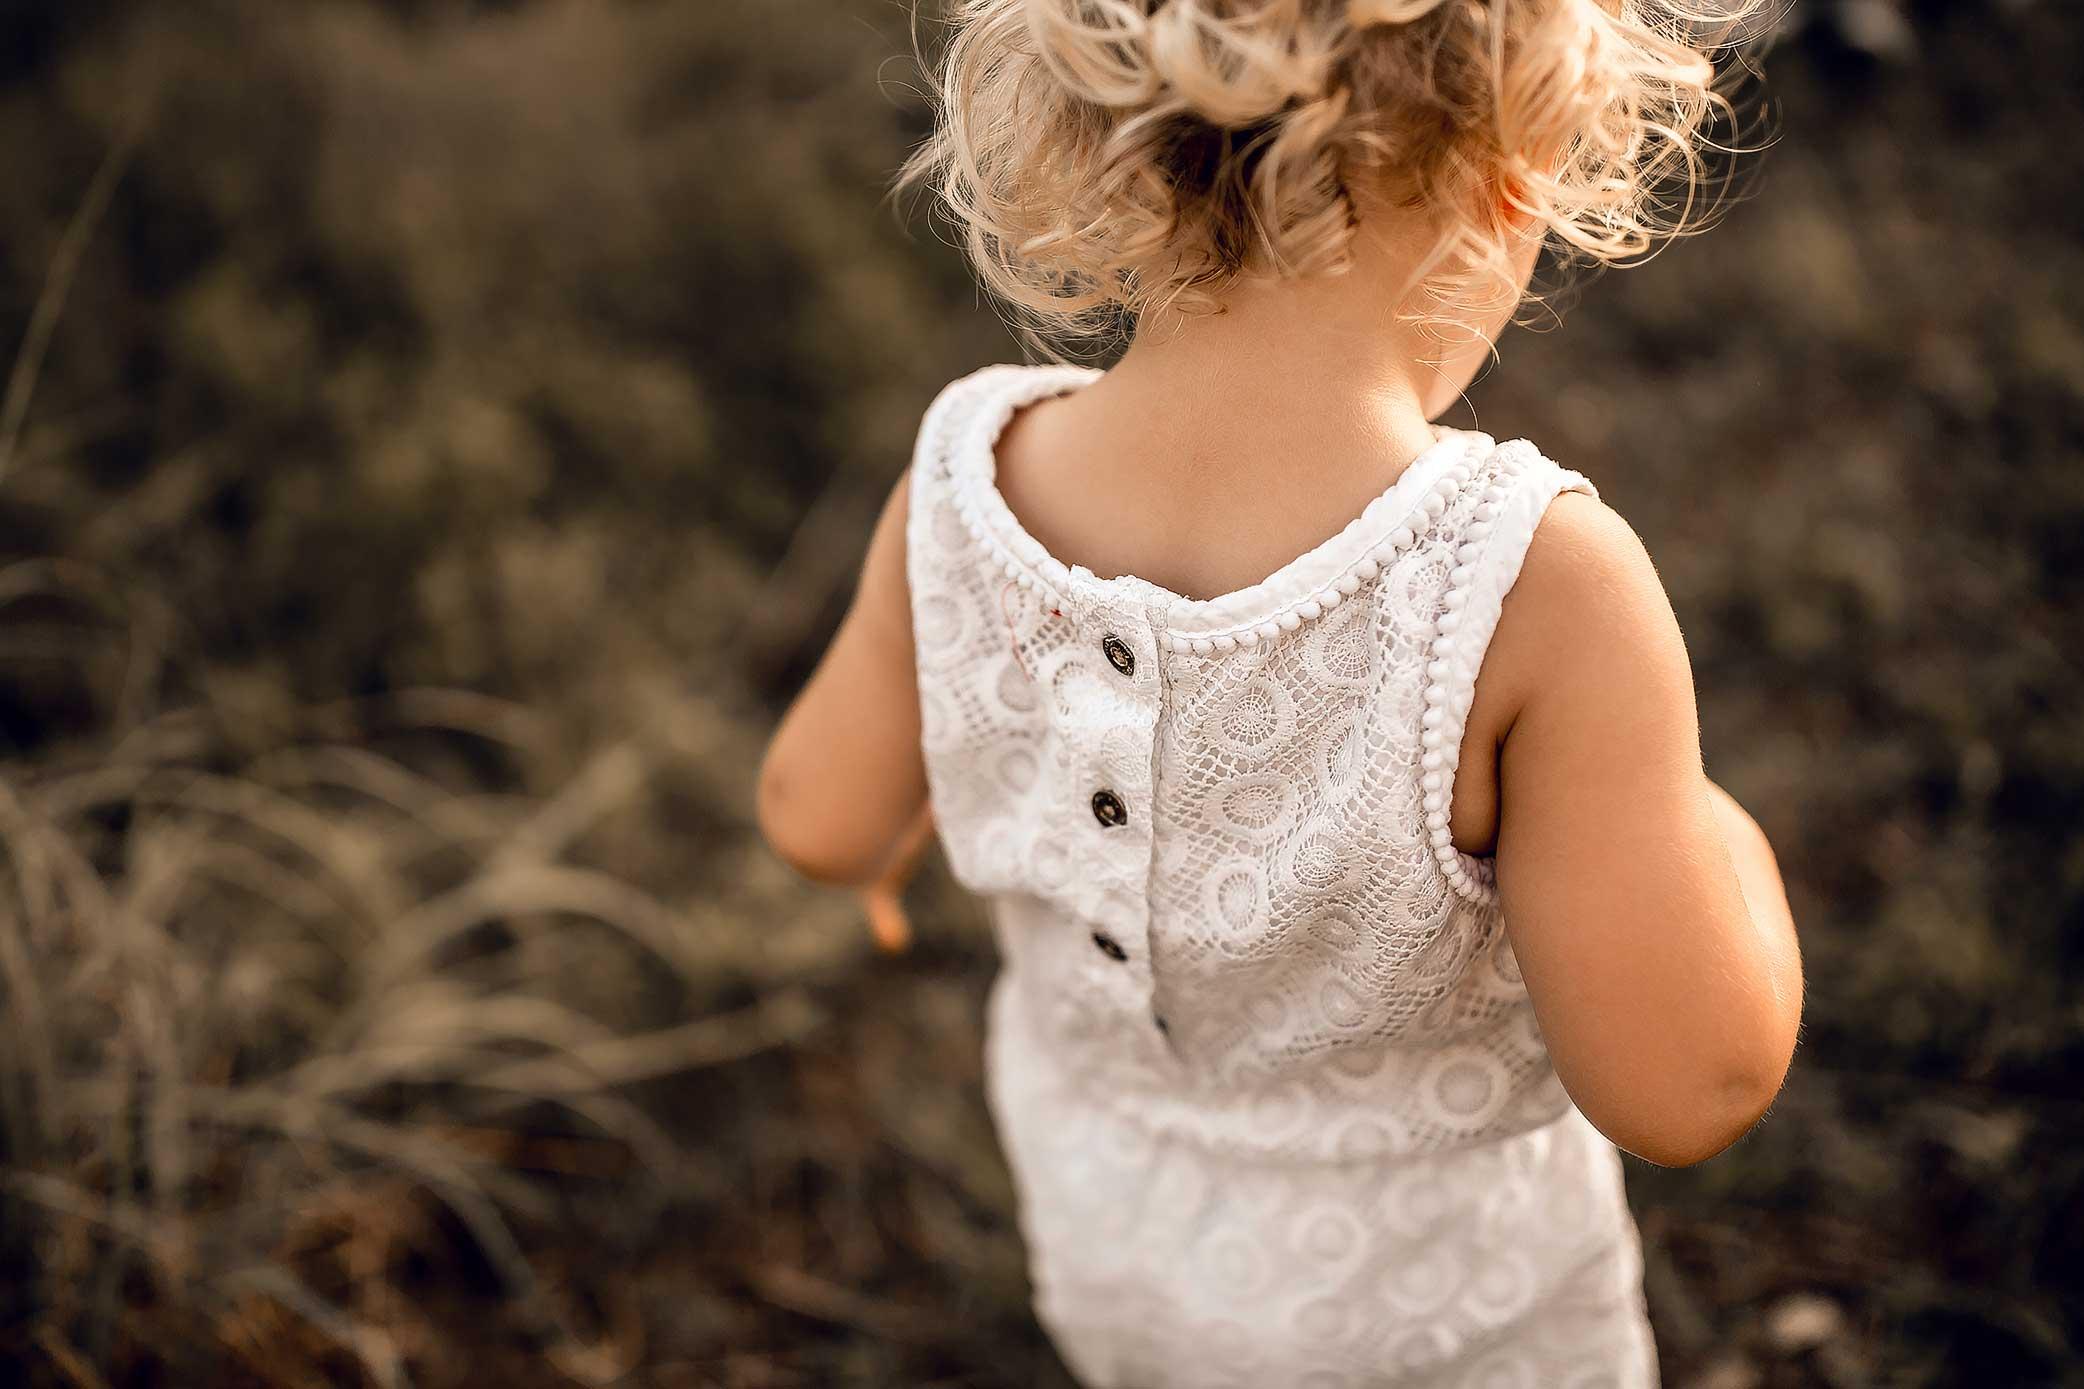 shelby-schiller-photography-family-toddler-adventuring-shoulders.jpg